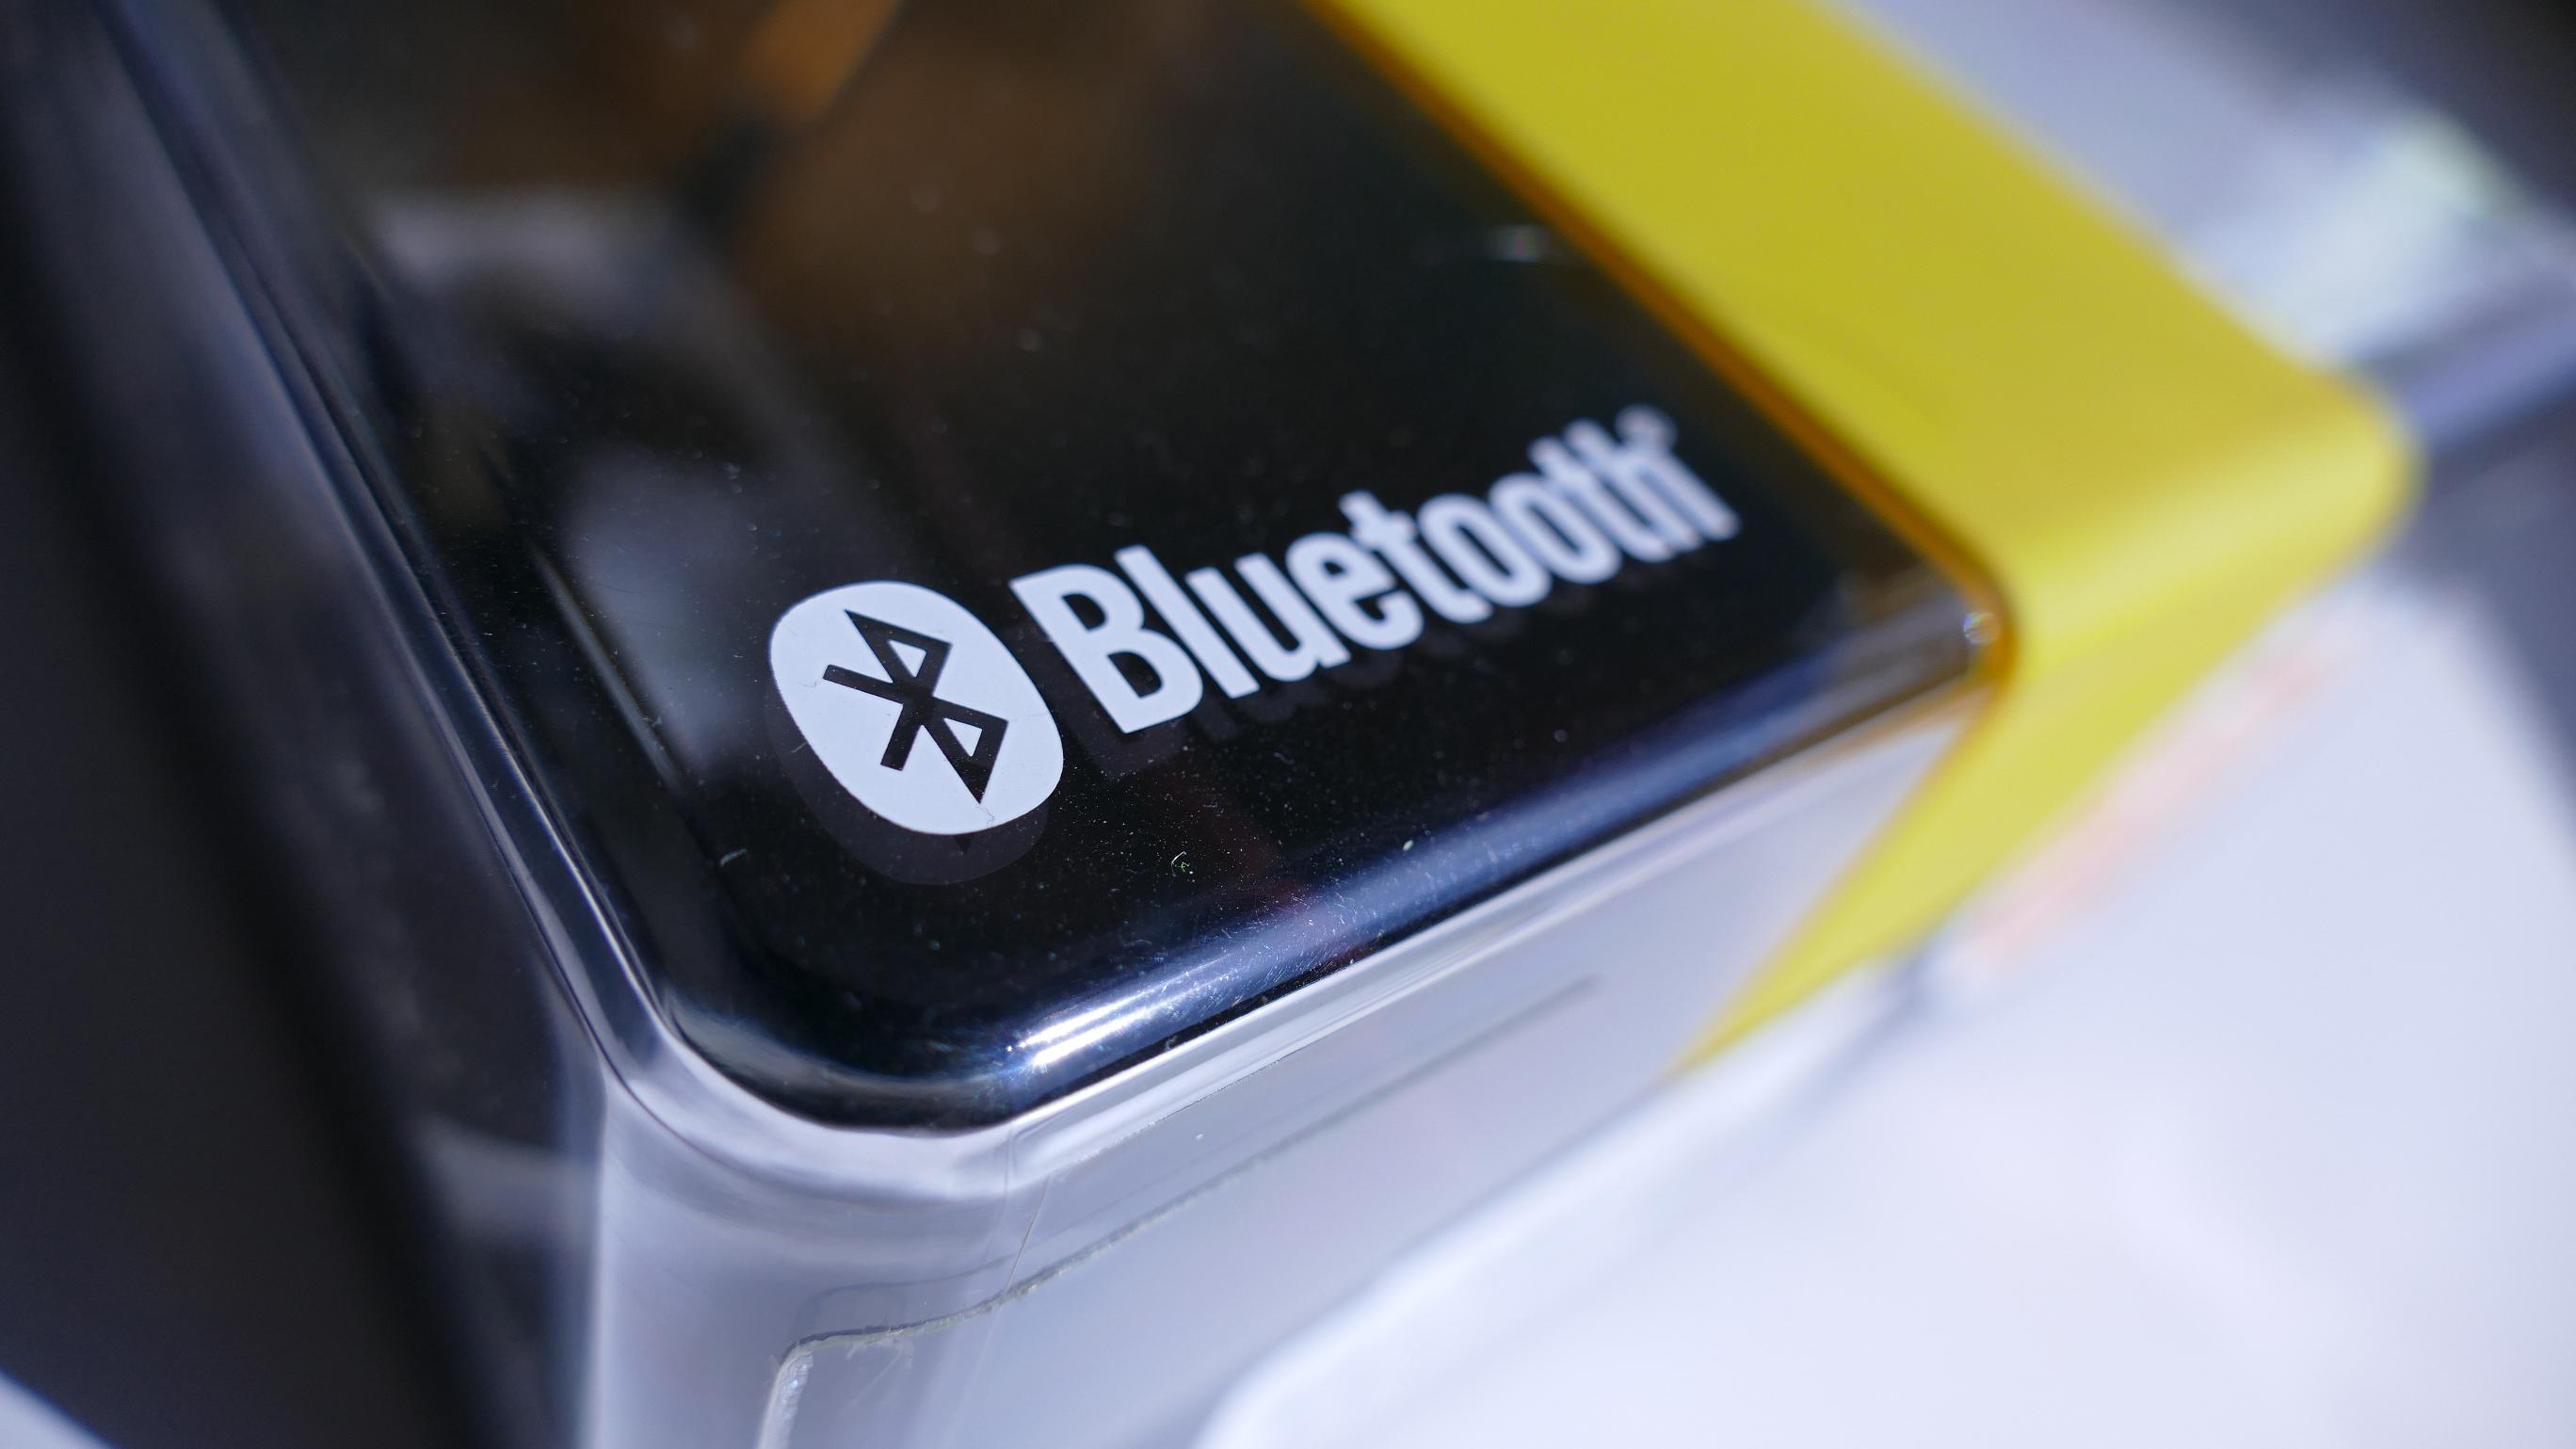 Bluetooth algemeen 16x9